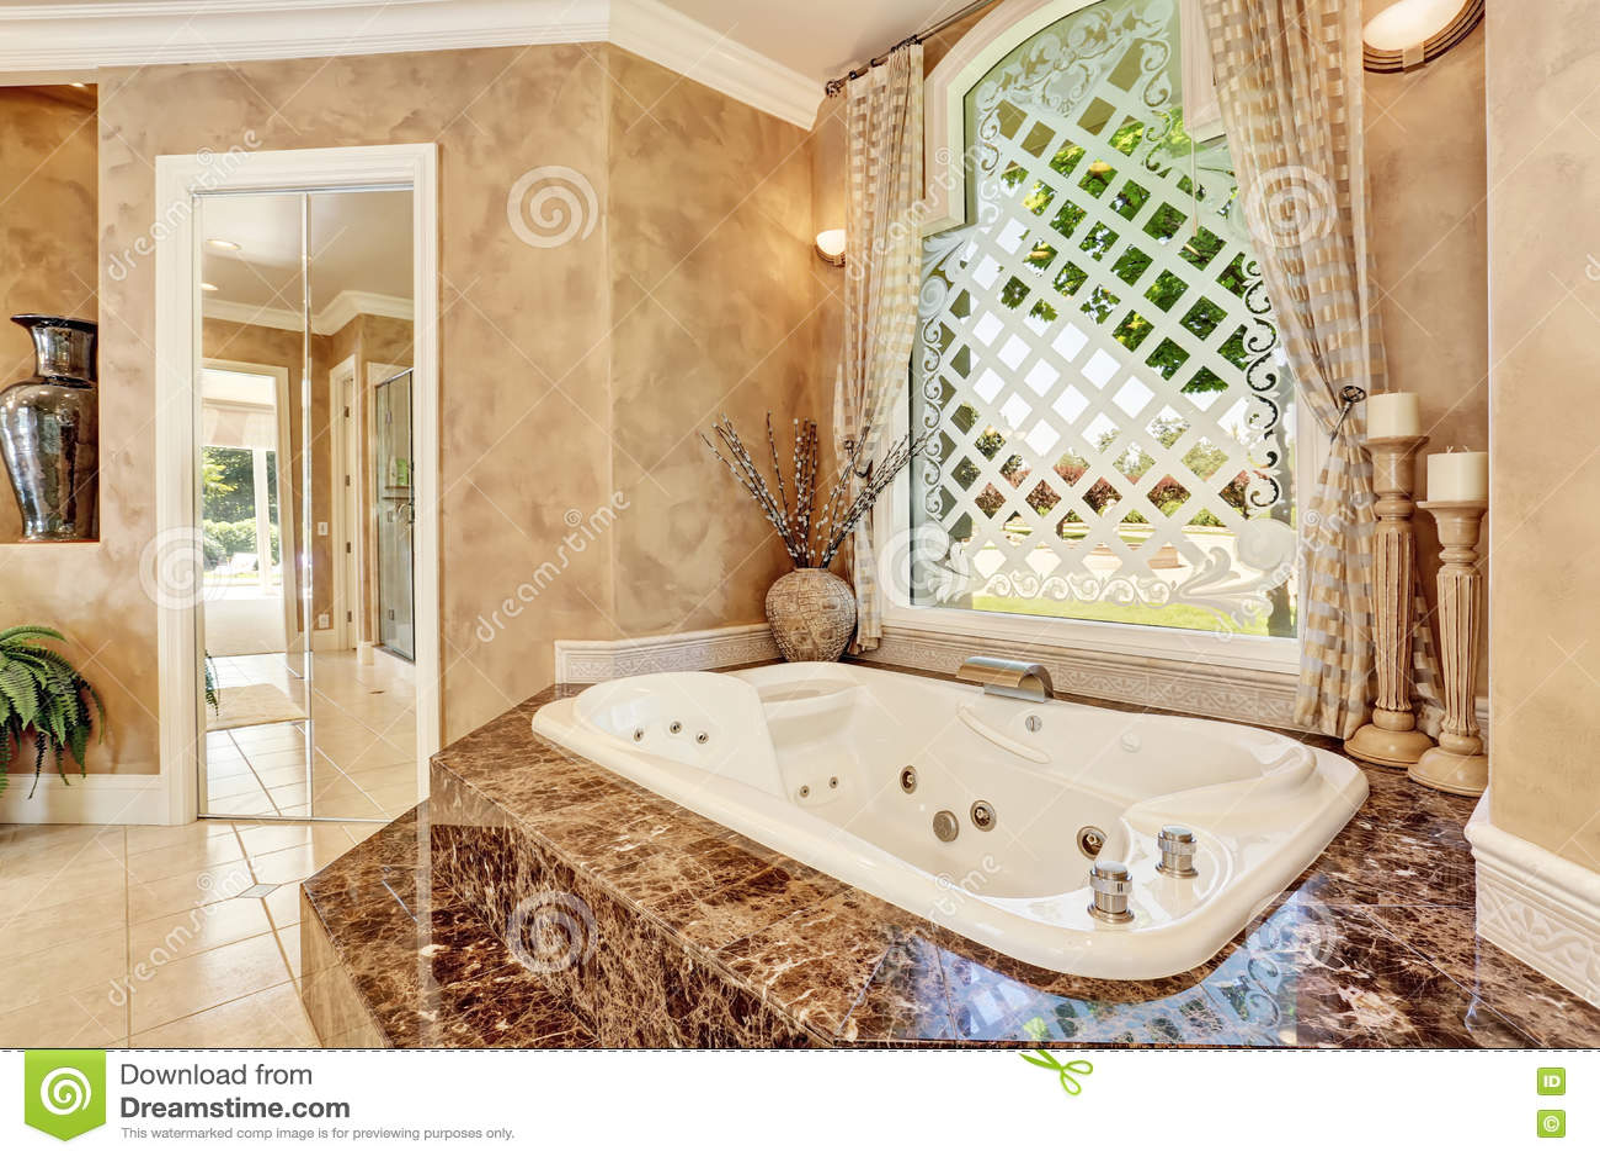 Beautiful Luxury Marble Bathroom Interior In Beige Color Stock Photo ...